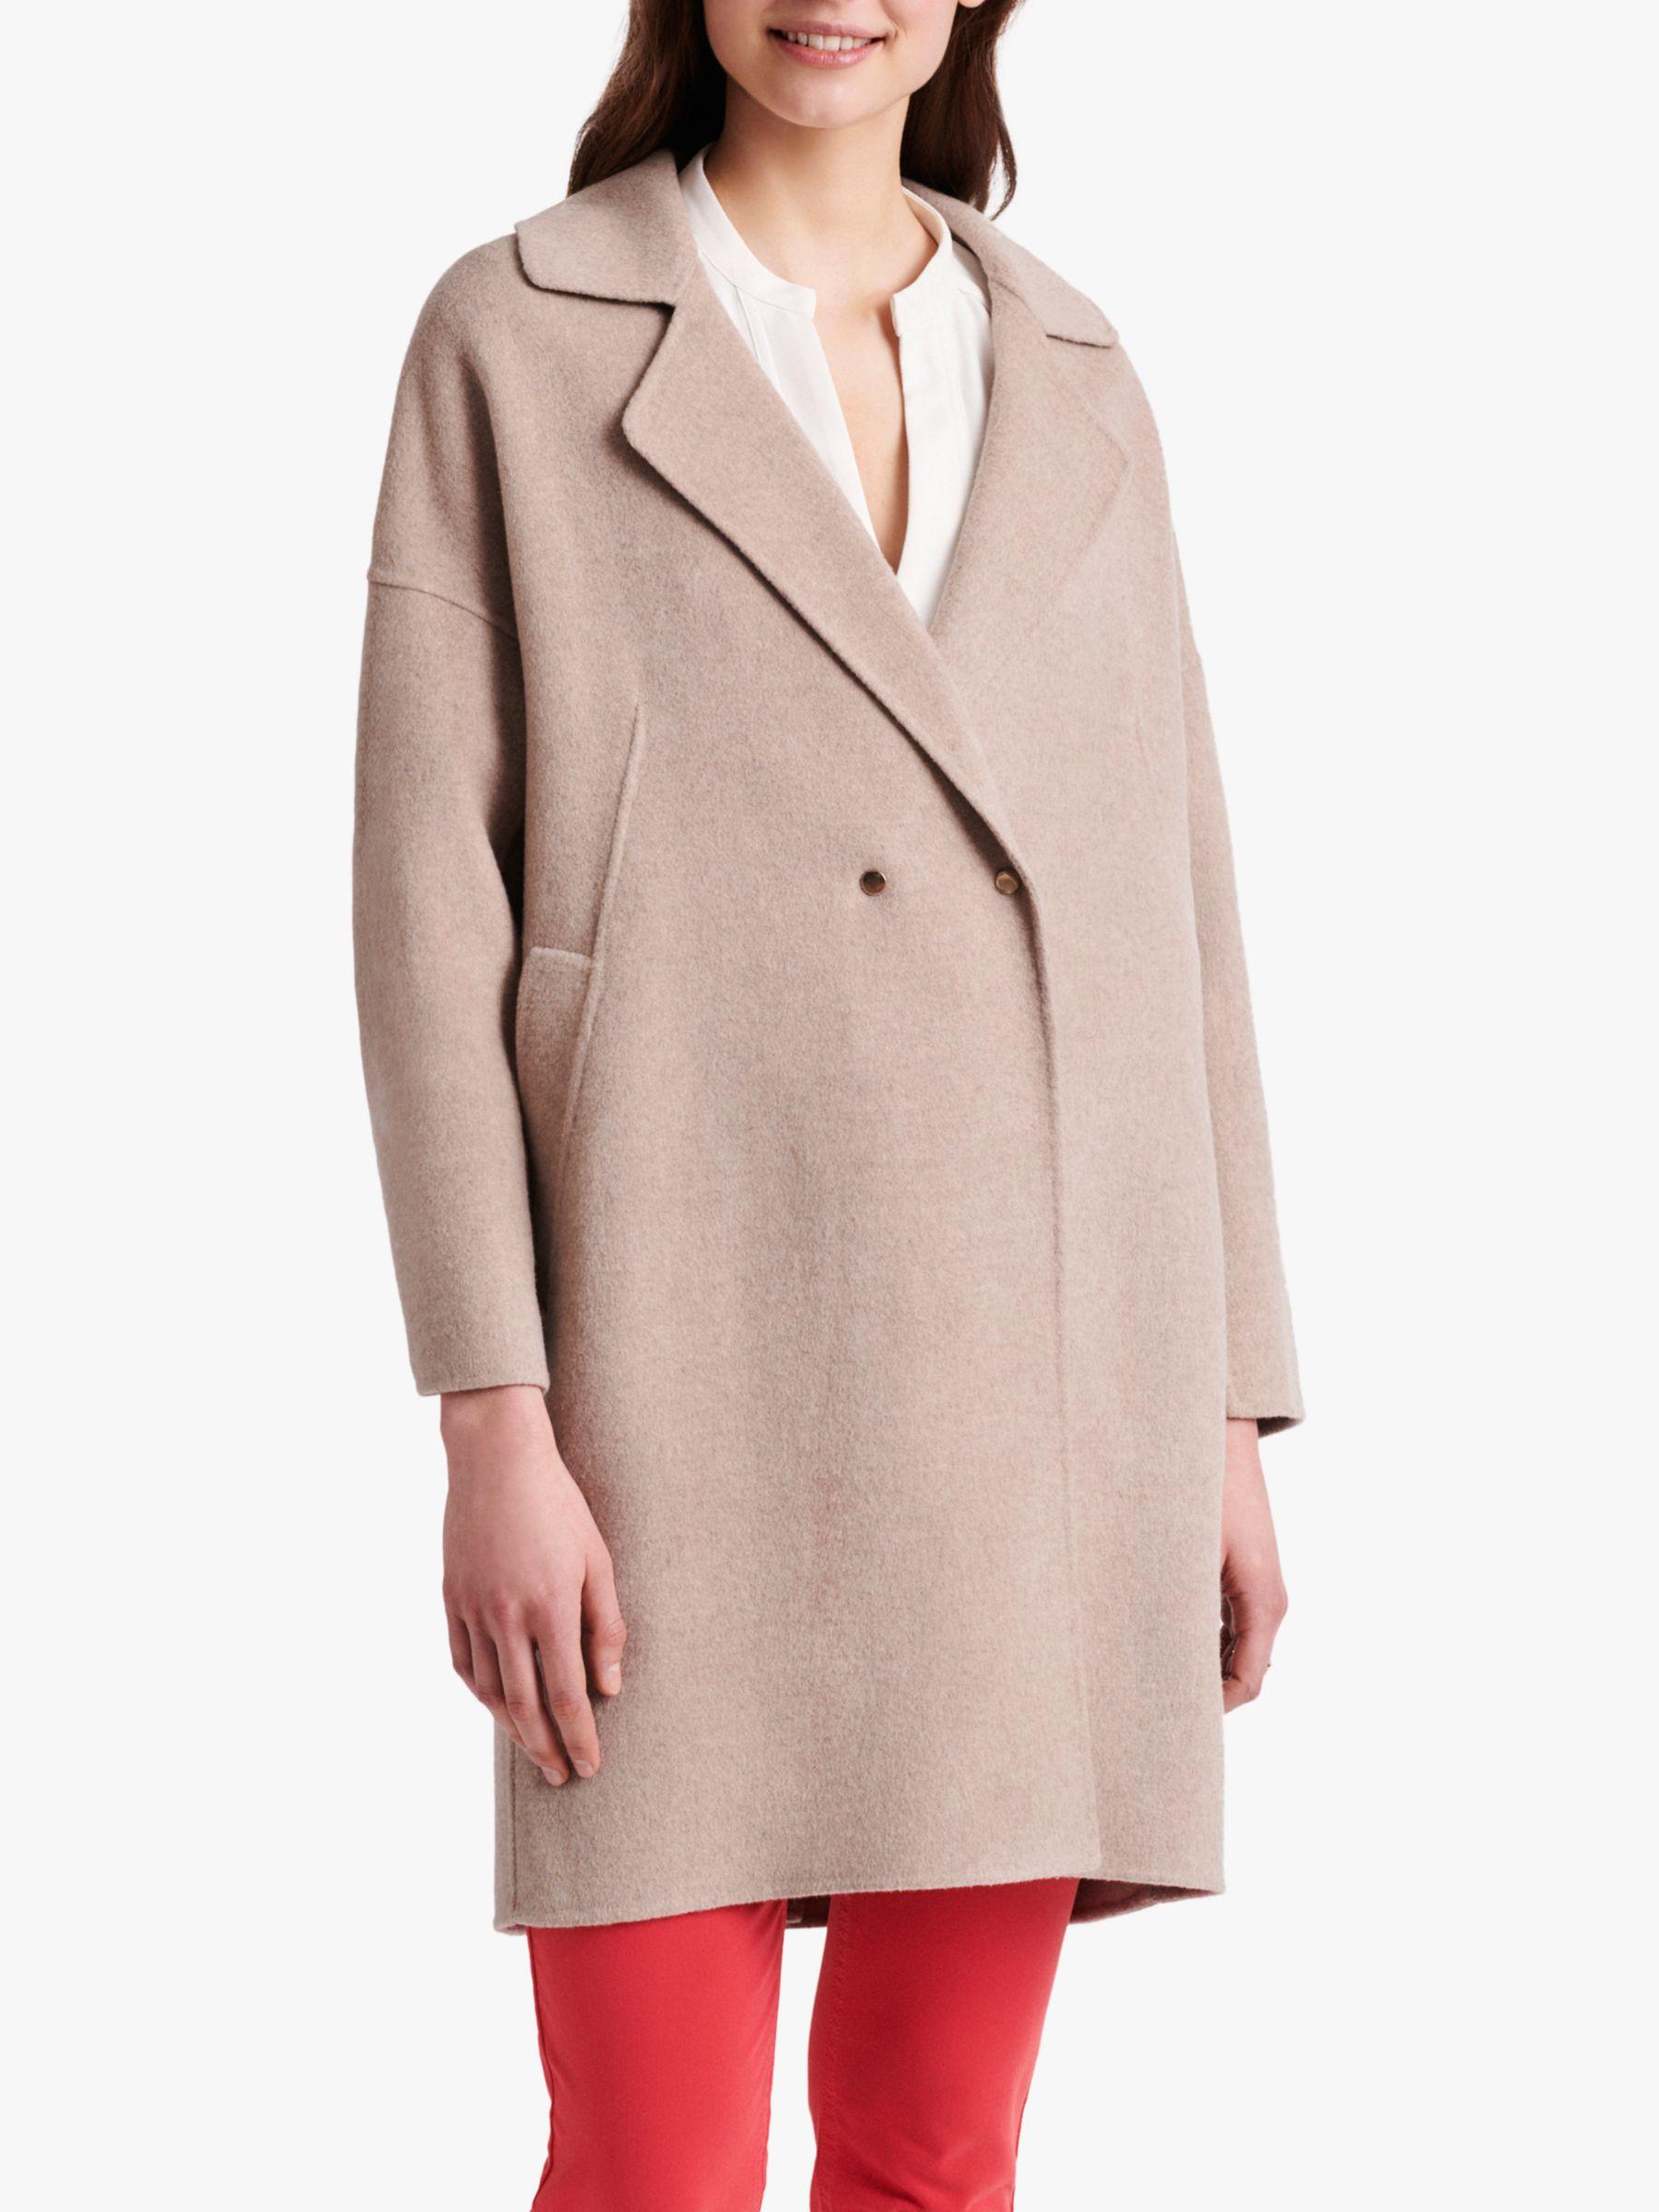 Gerard Darel Gerard Darel Rachel Longline Wool Coat, Beige